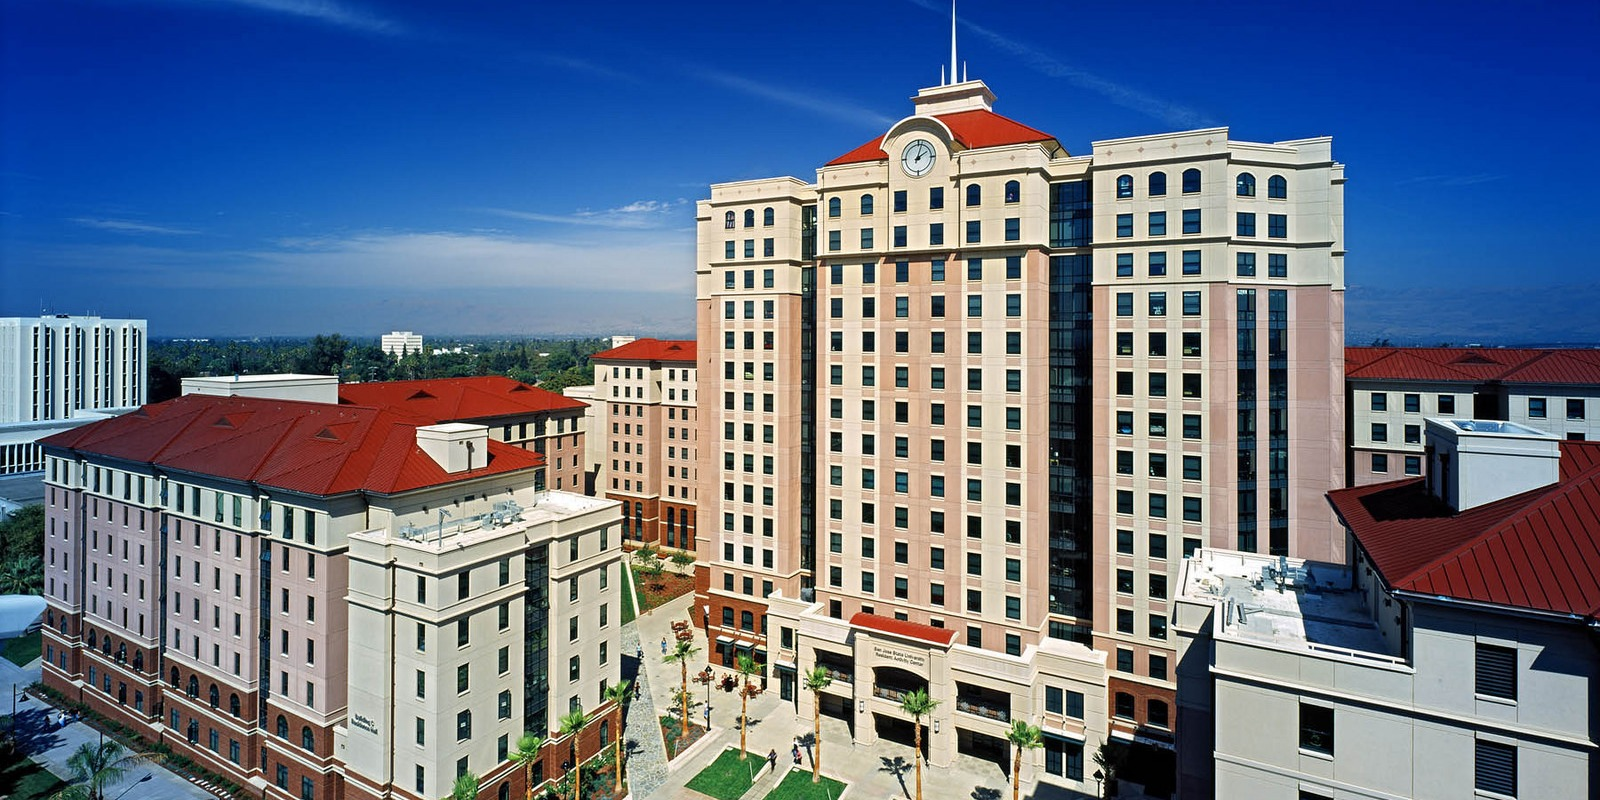 ISI国際学院ジュニア中高生の短期留学サンフランシスコキャンプ